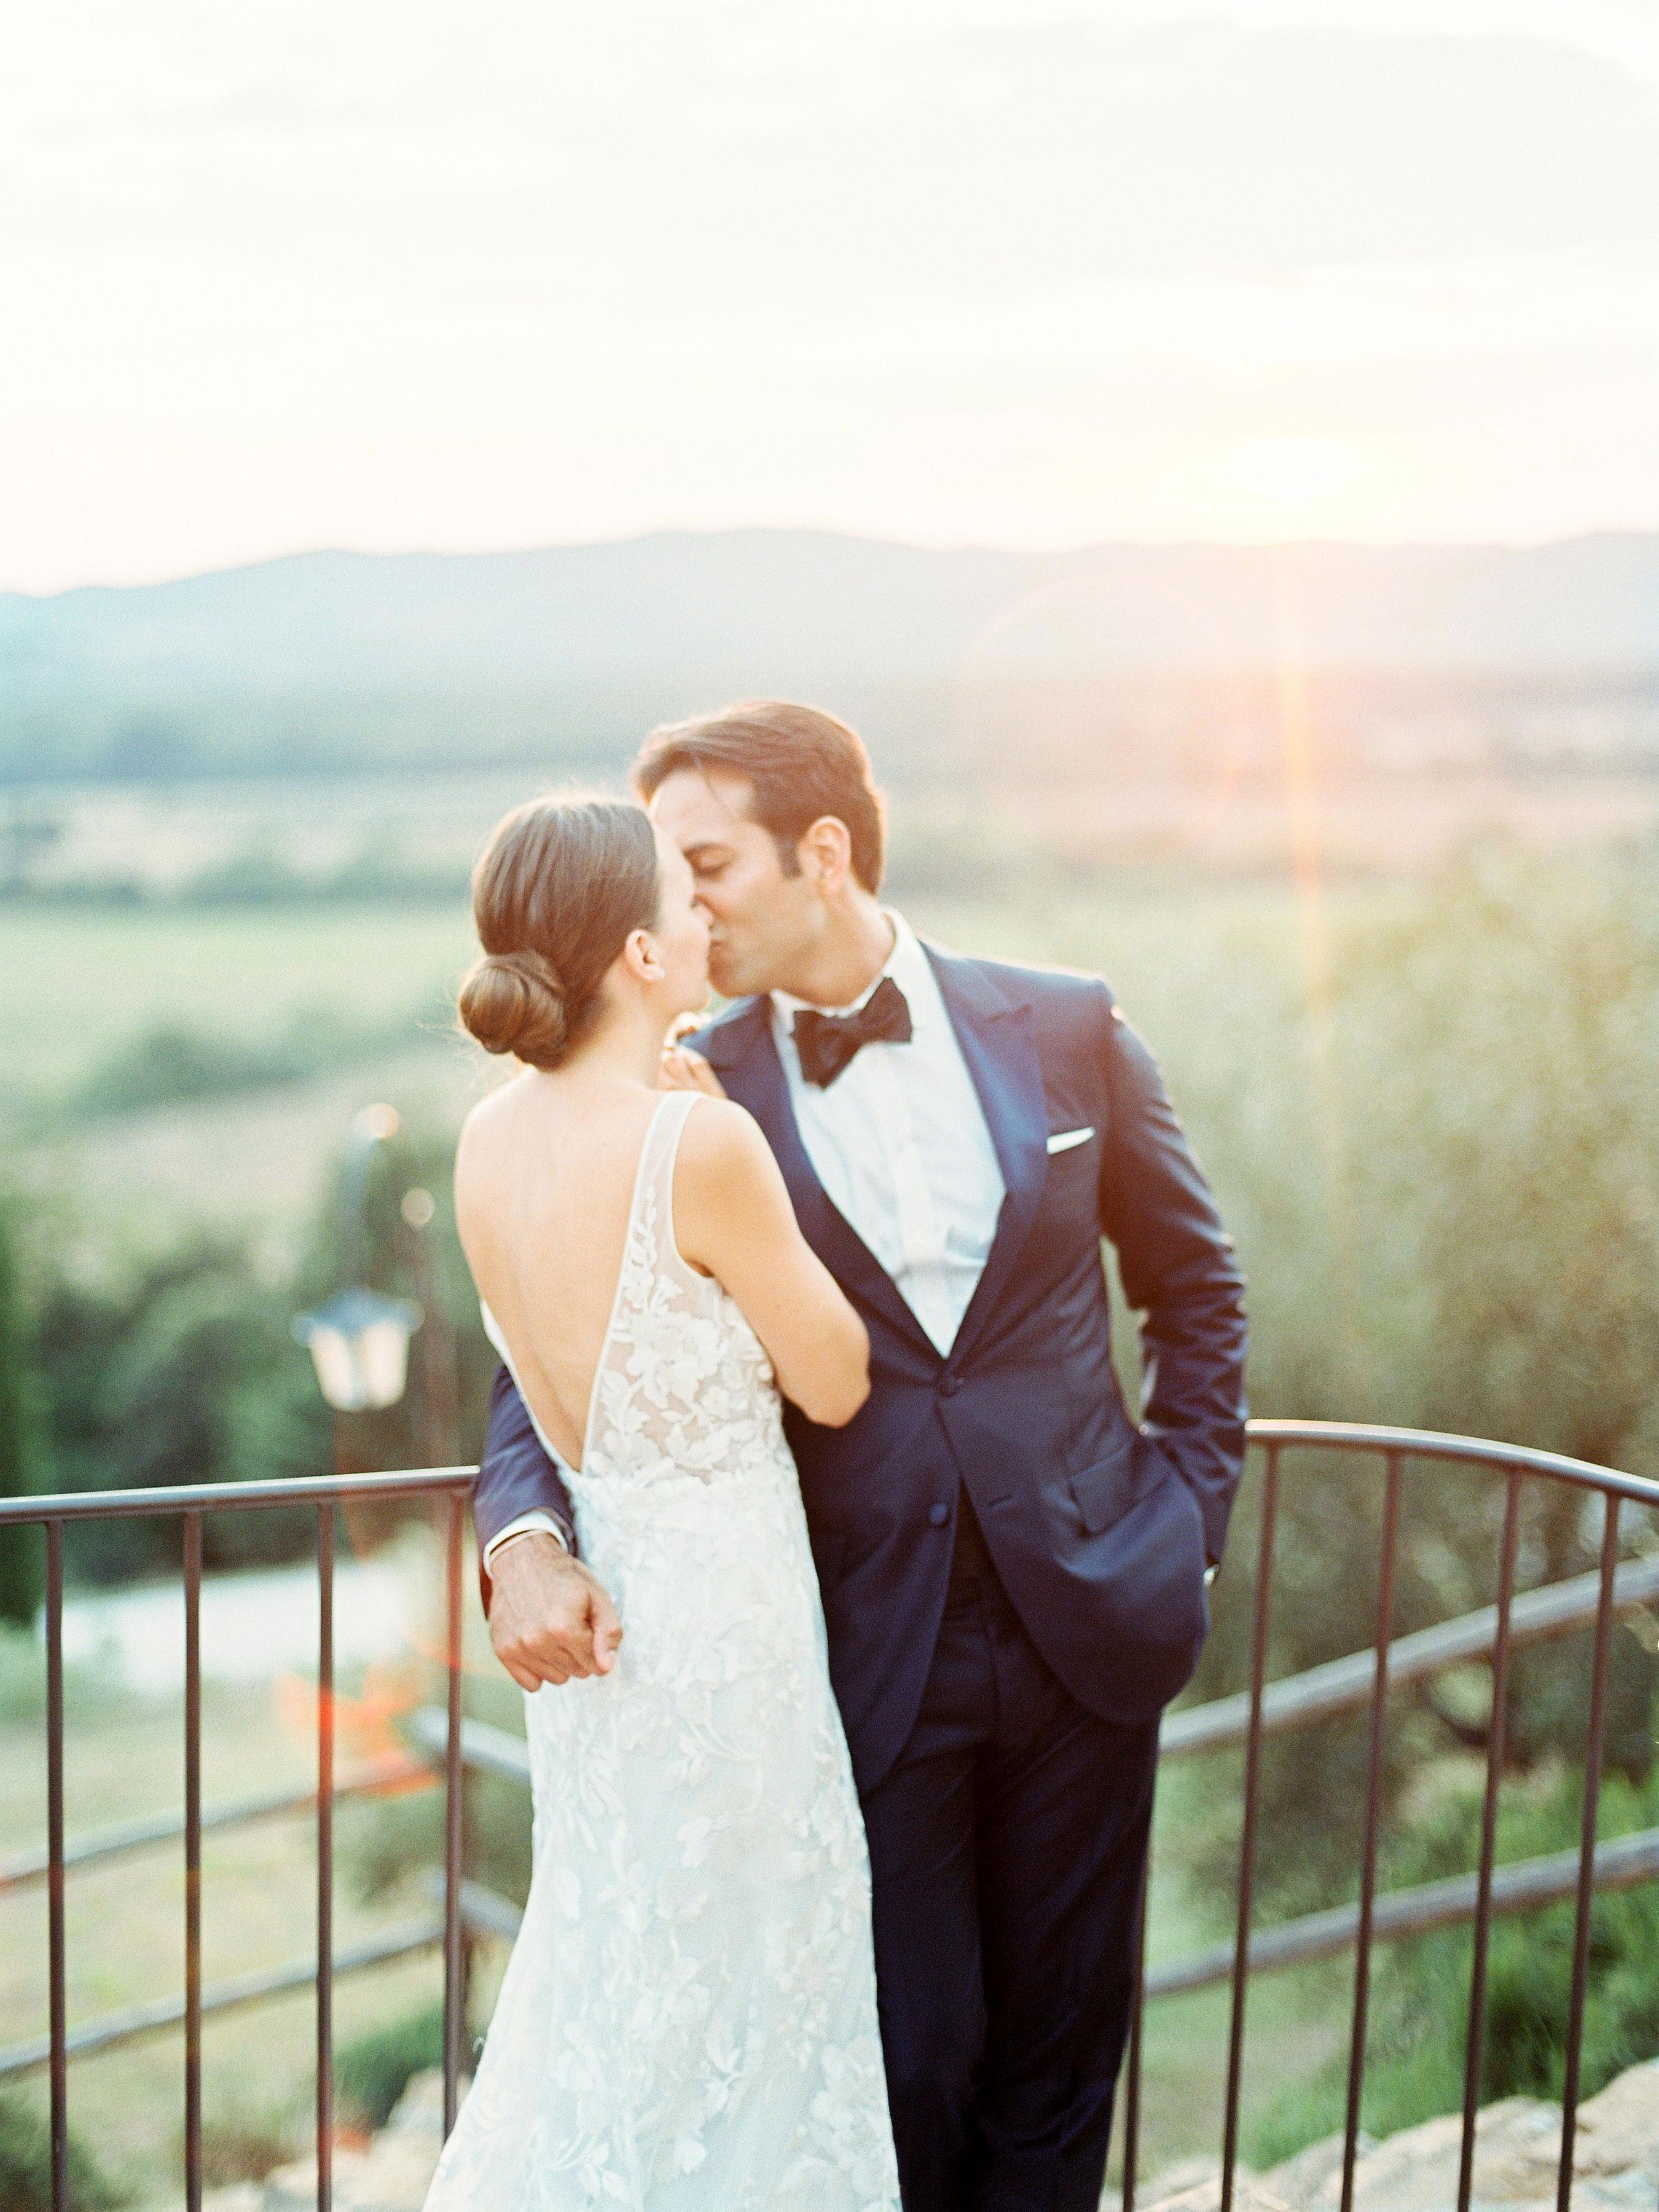 kseniya sadhir wedding couple kissing on balcony